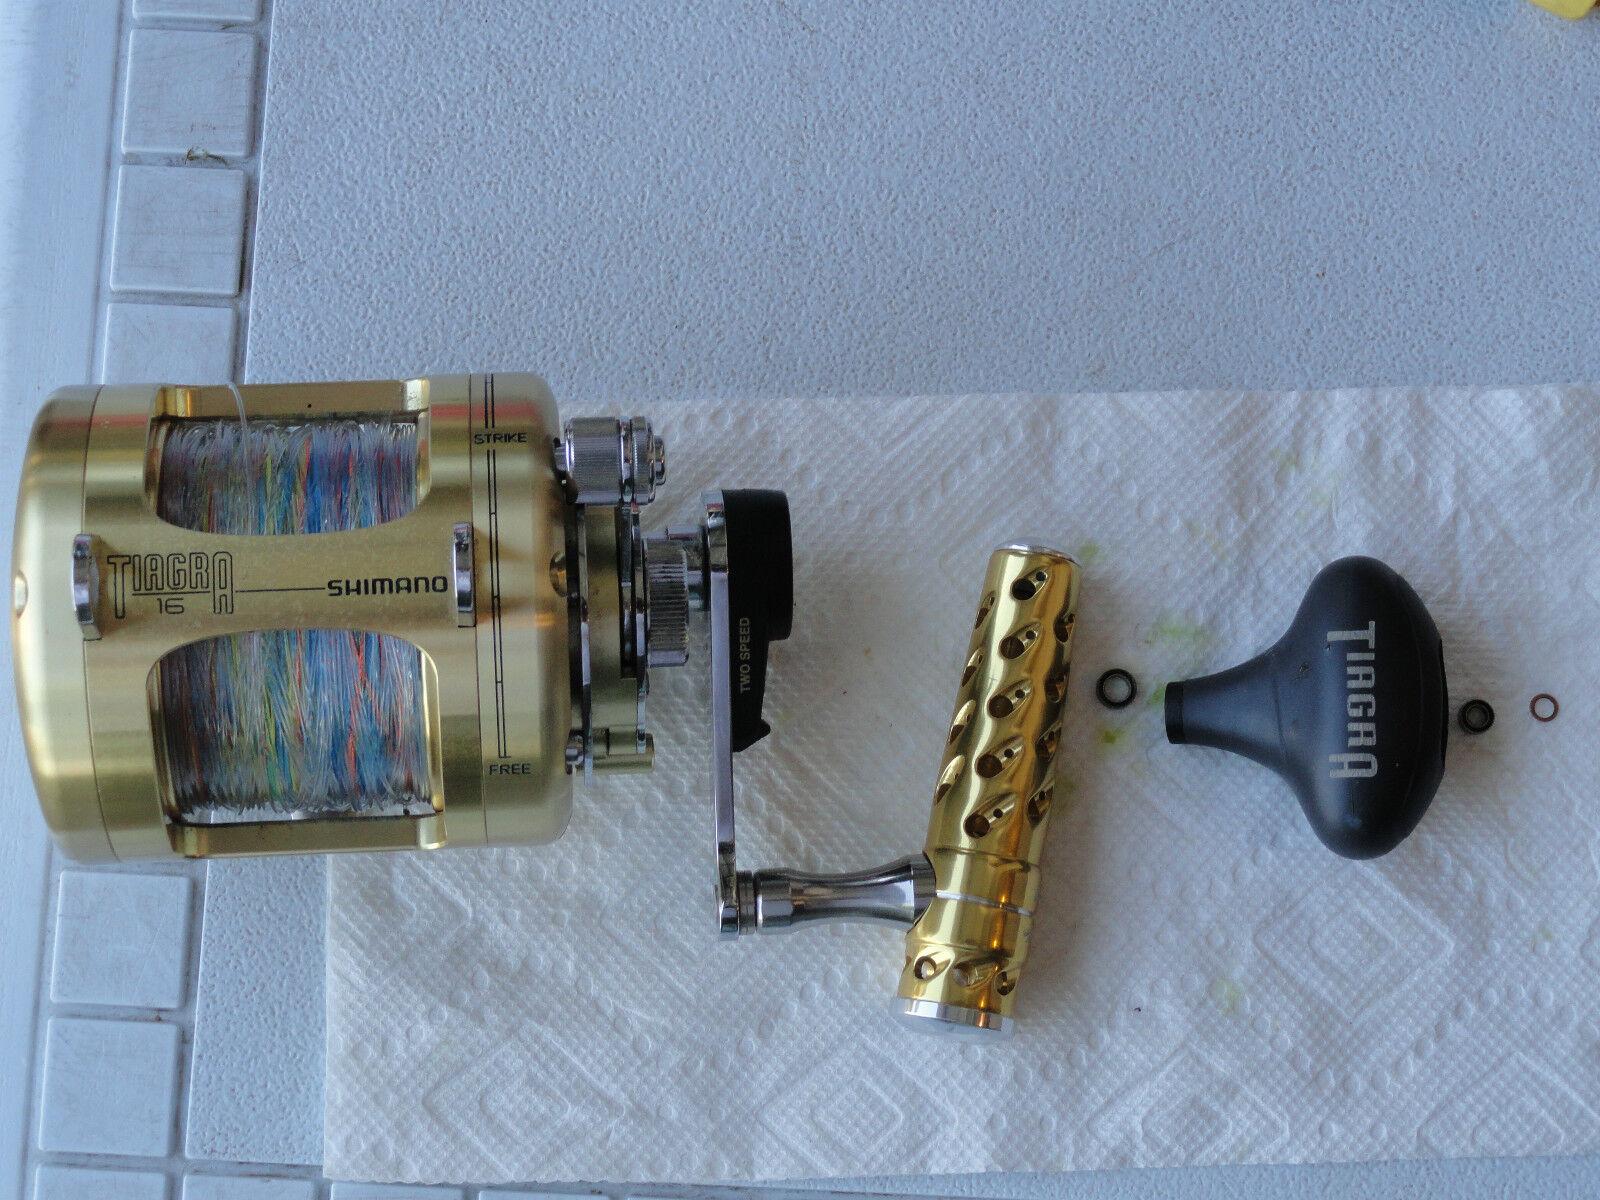 UJ T092 T-BAR handle knob W/2 BB BB BB for Shimano Talica 1025 Tiagra TI1216 reel PG af9798